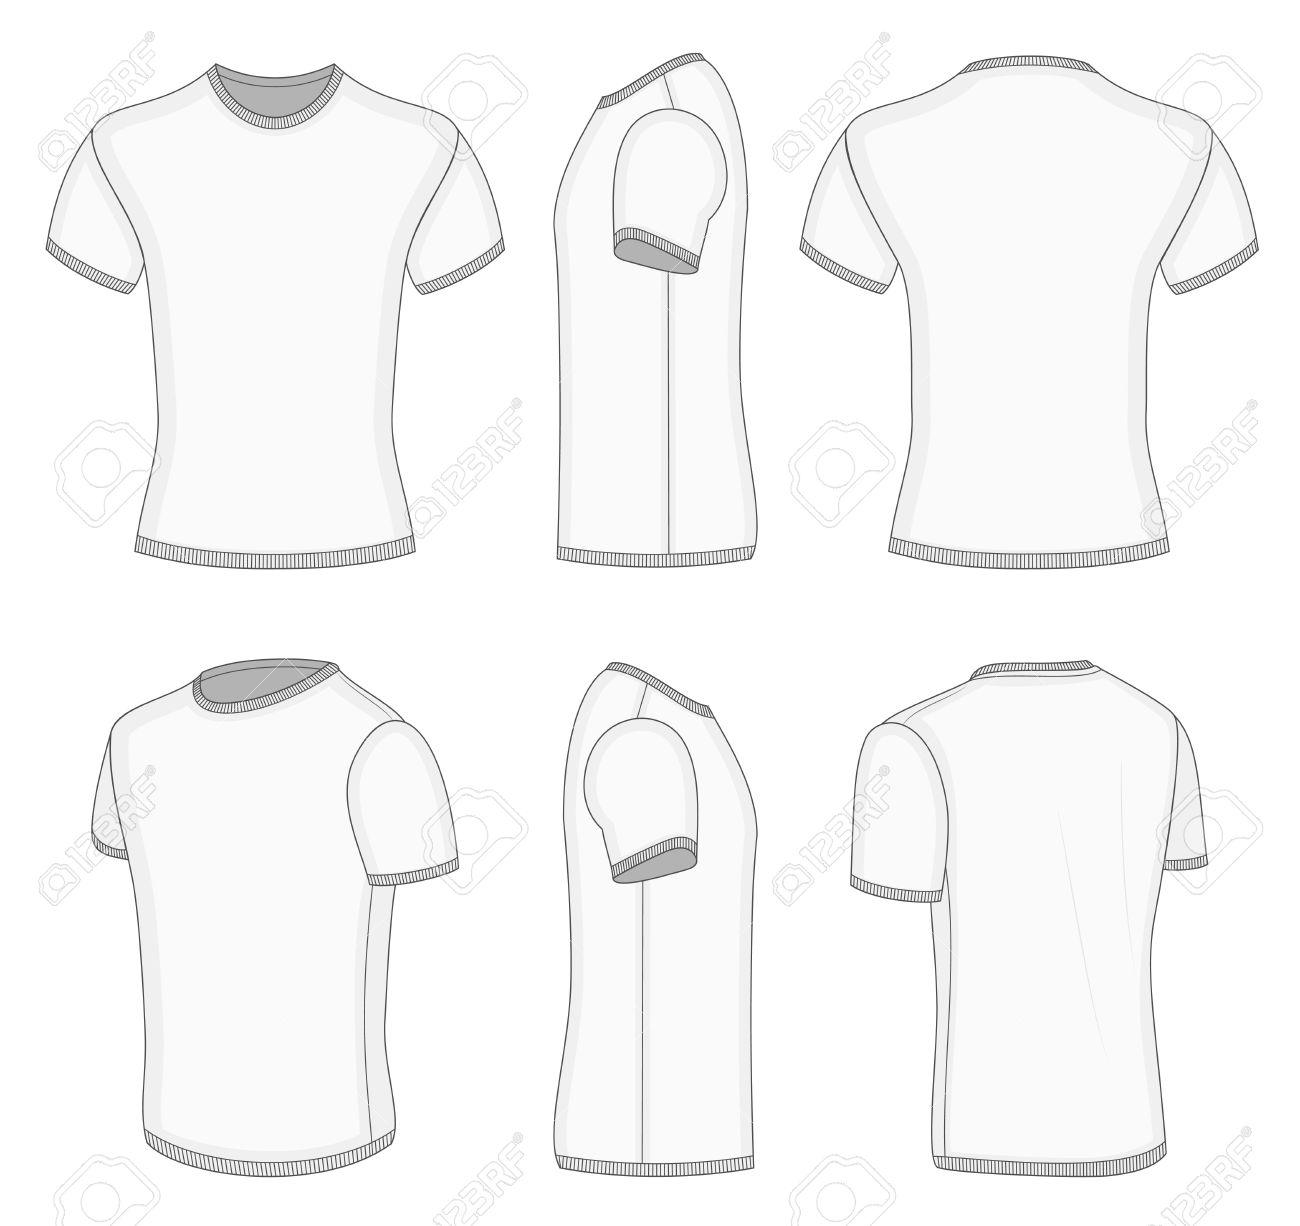 All Six Views Mens White Short Sleeve Tshirt Design Templates - Tee shirt design template